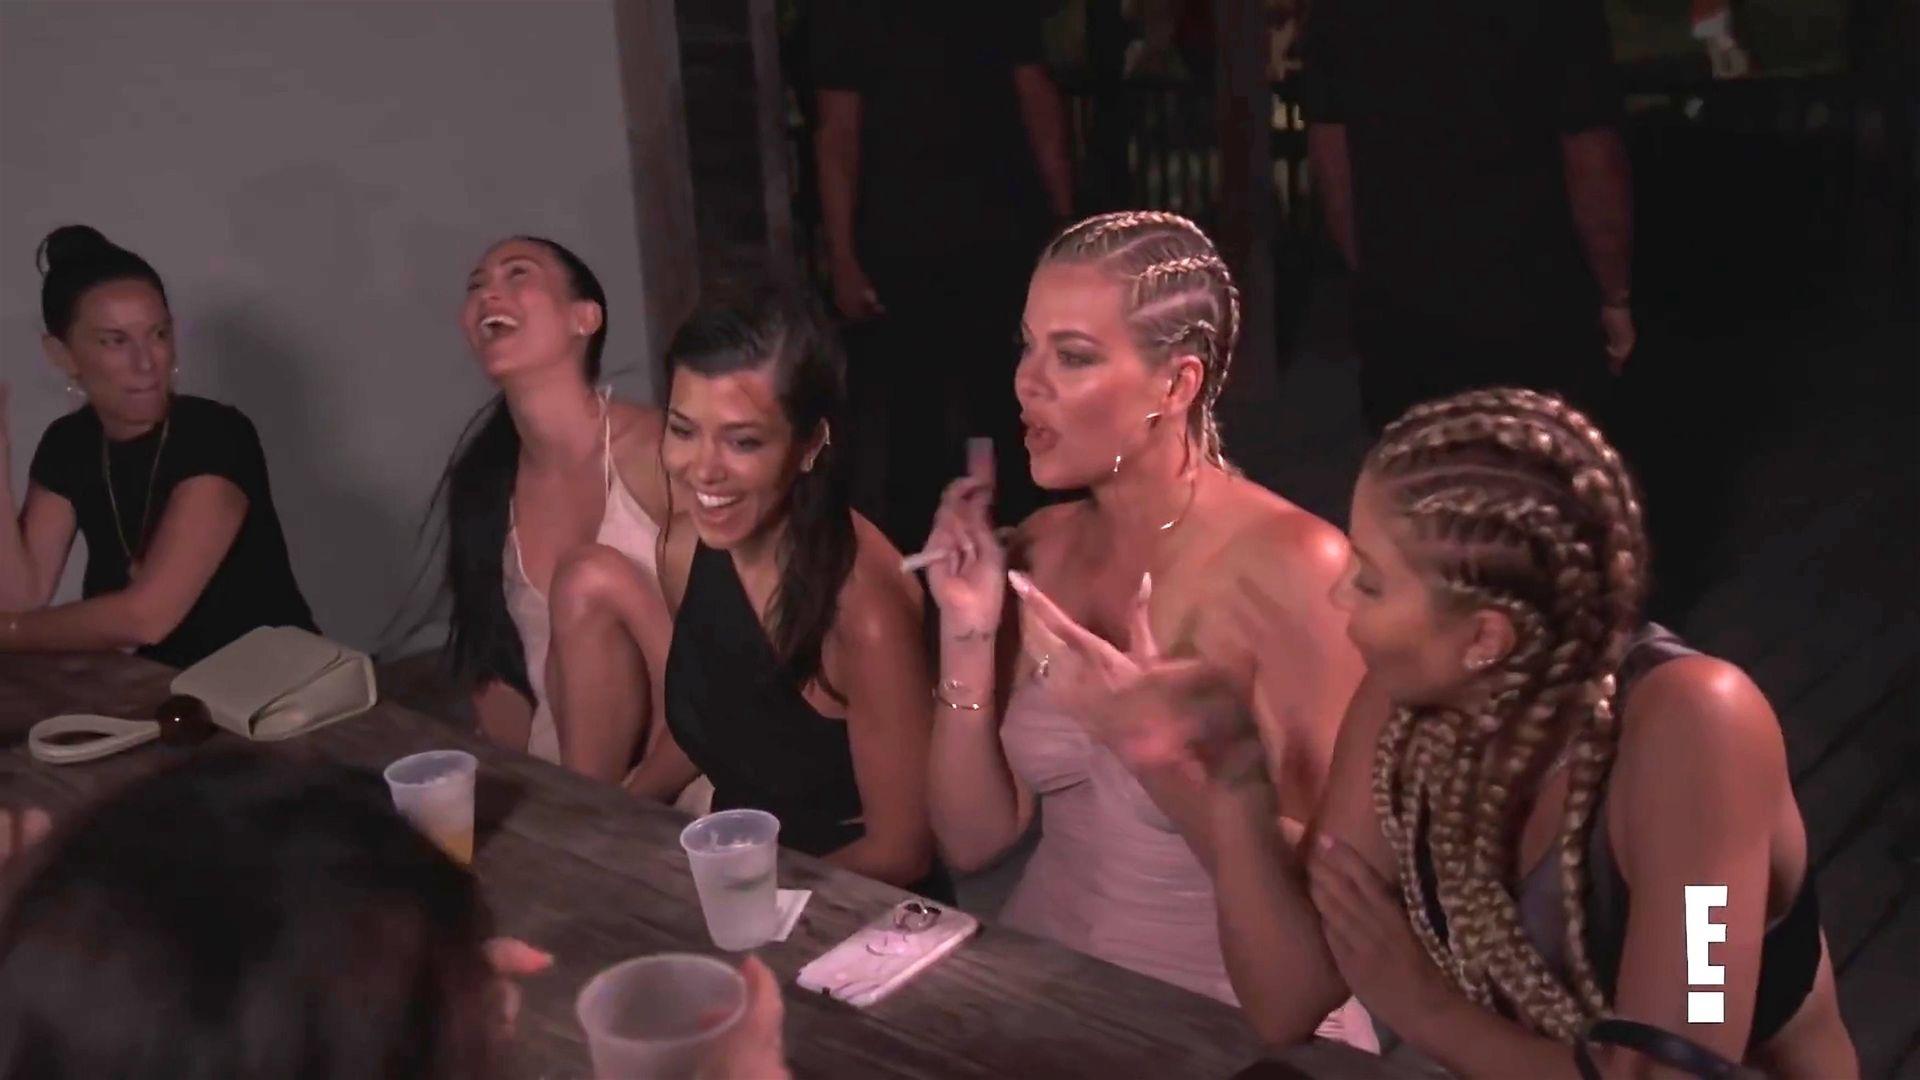 Khloé Kardashian Gets A Little Cold Without A Bra 0006